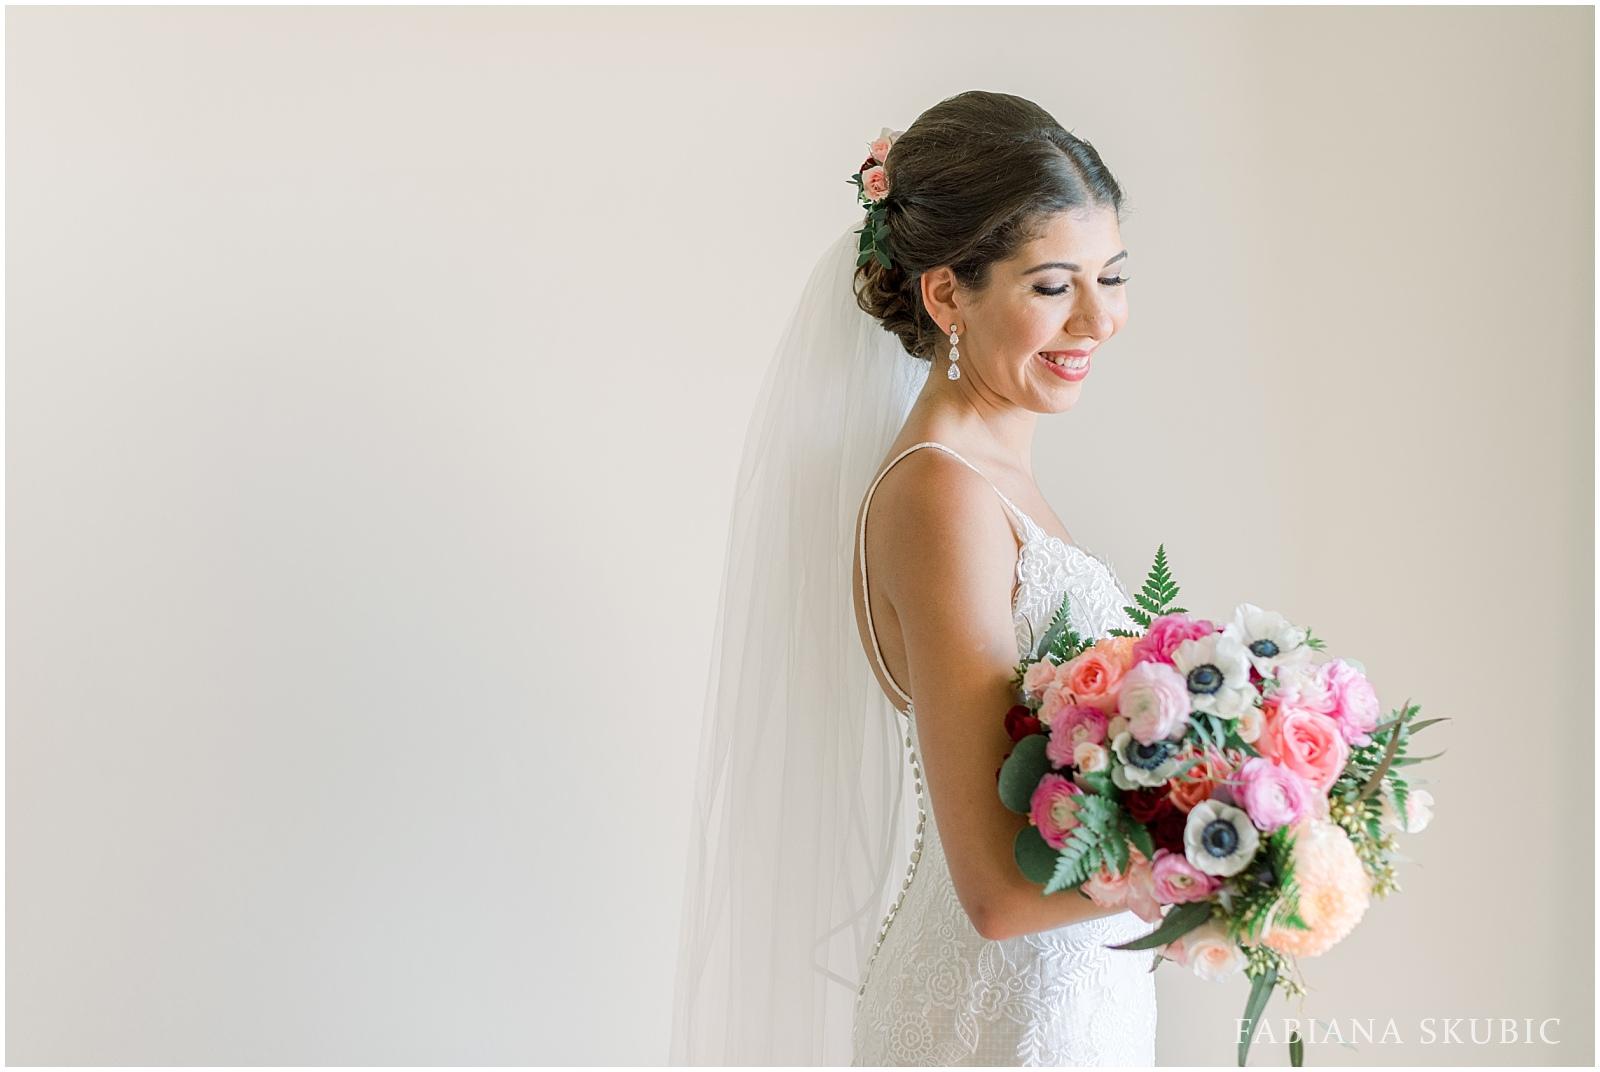 TJ_Now_Sapphire_Riviera_Cancun_Mexico_Wedding_Photos_0173.jpg